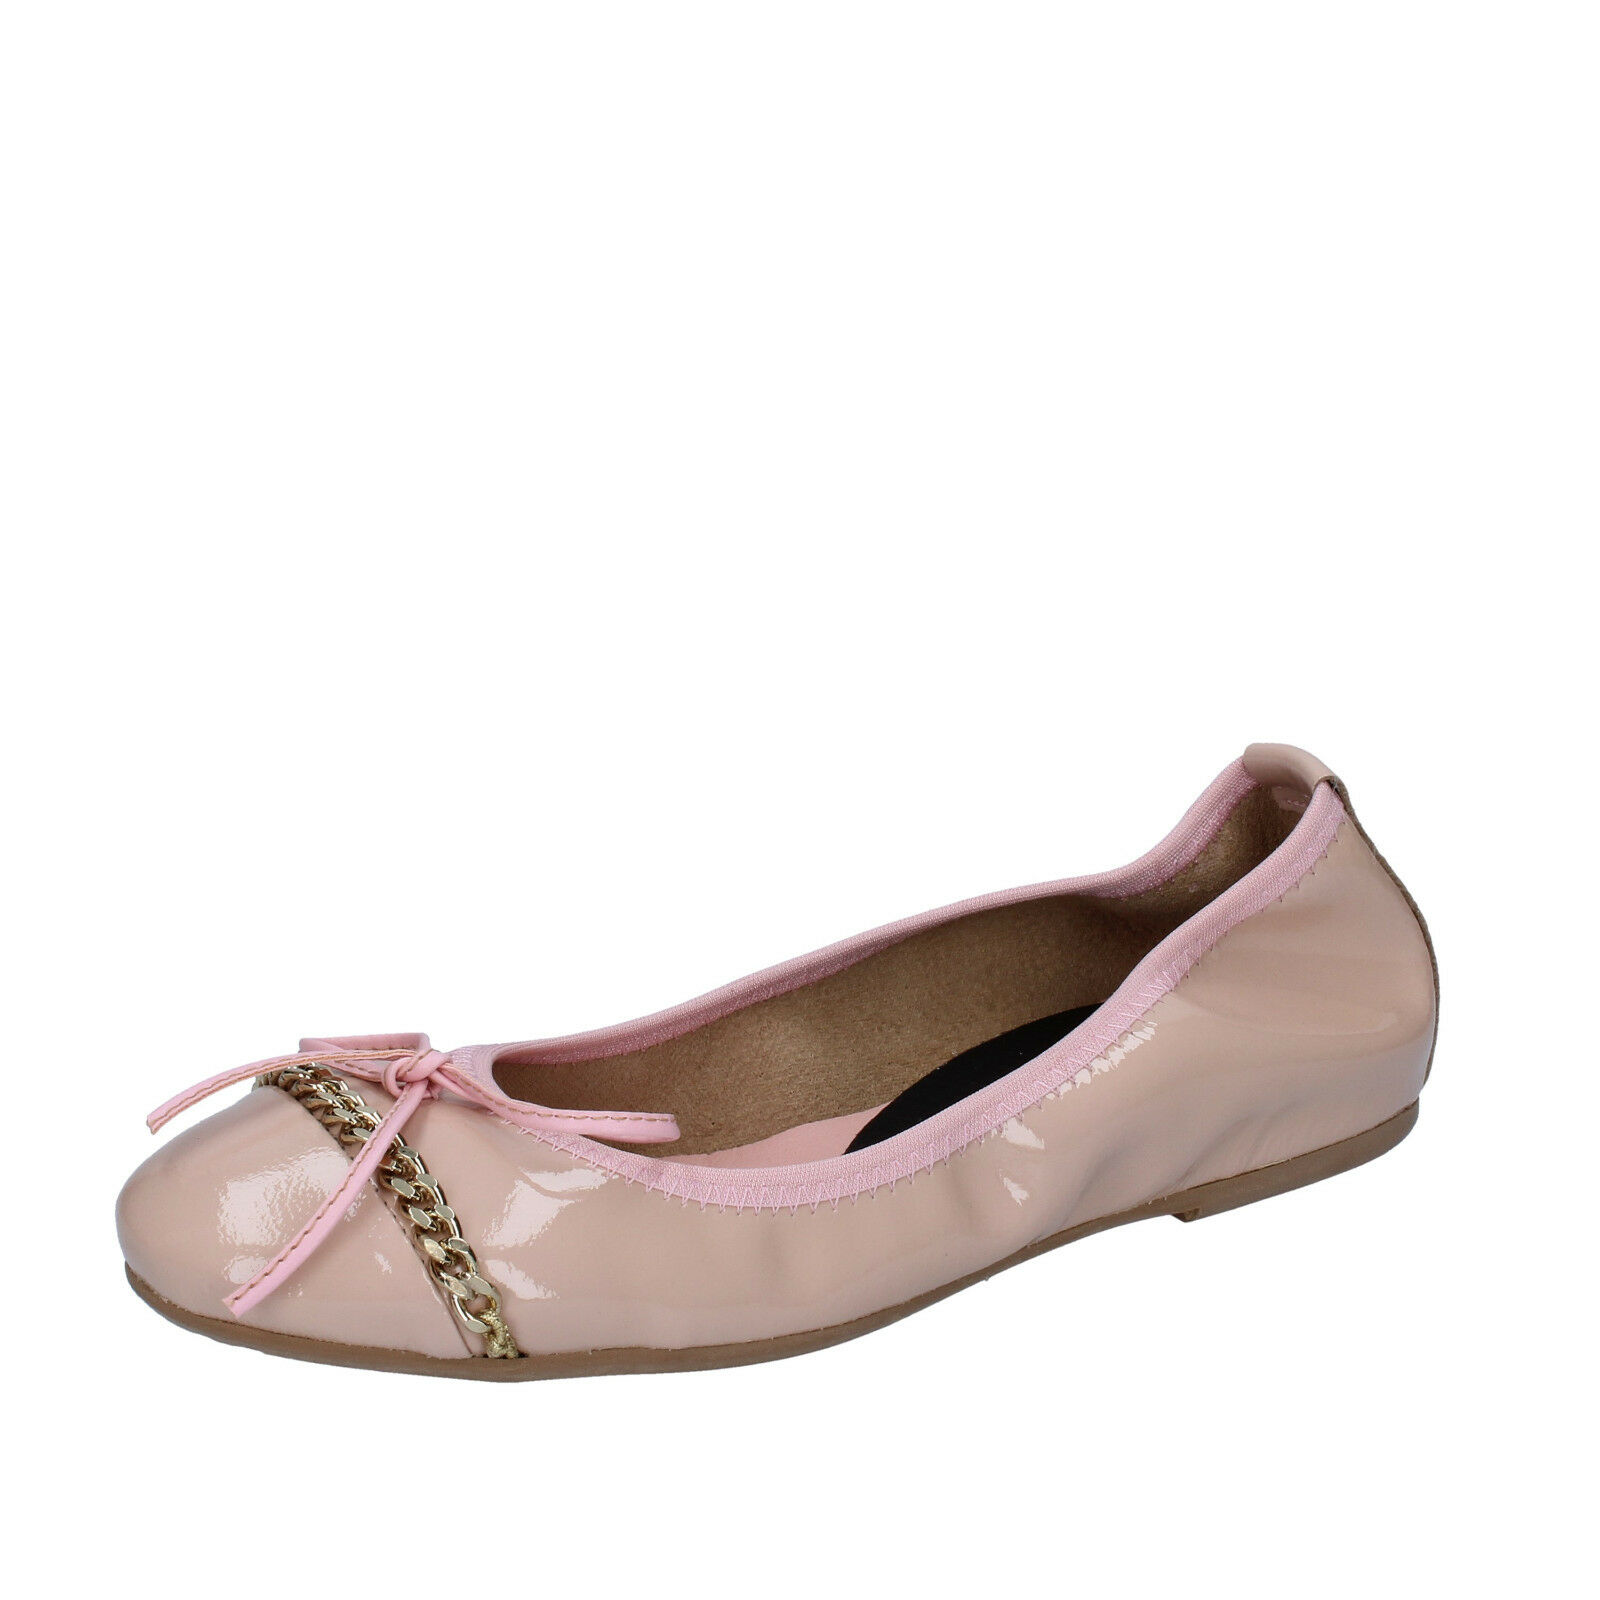 Scarpe donna CROWN 37 ballerine rosa cipria vernice BZ941-D